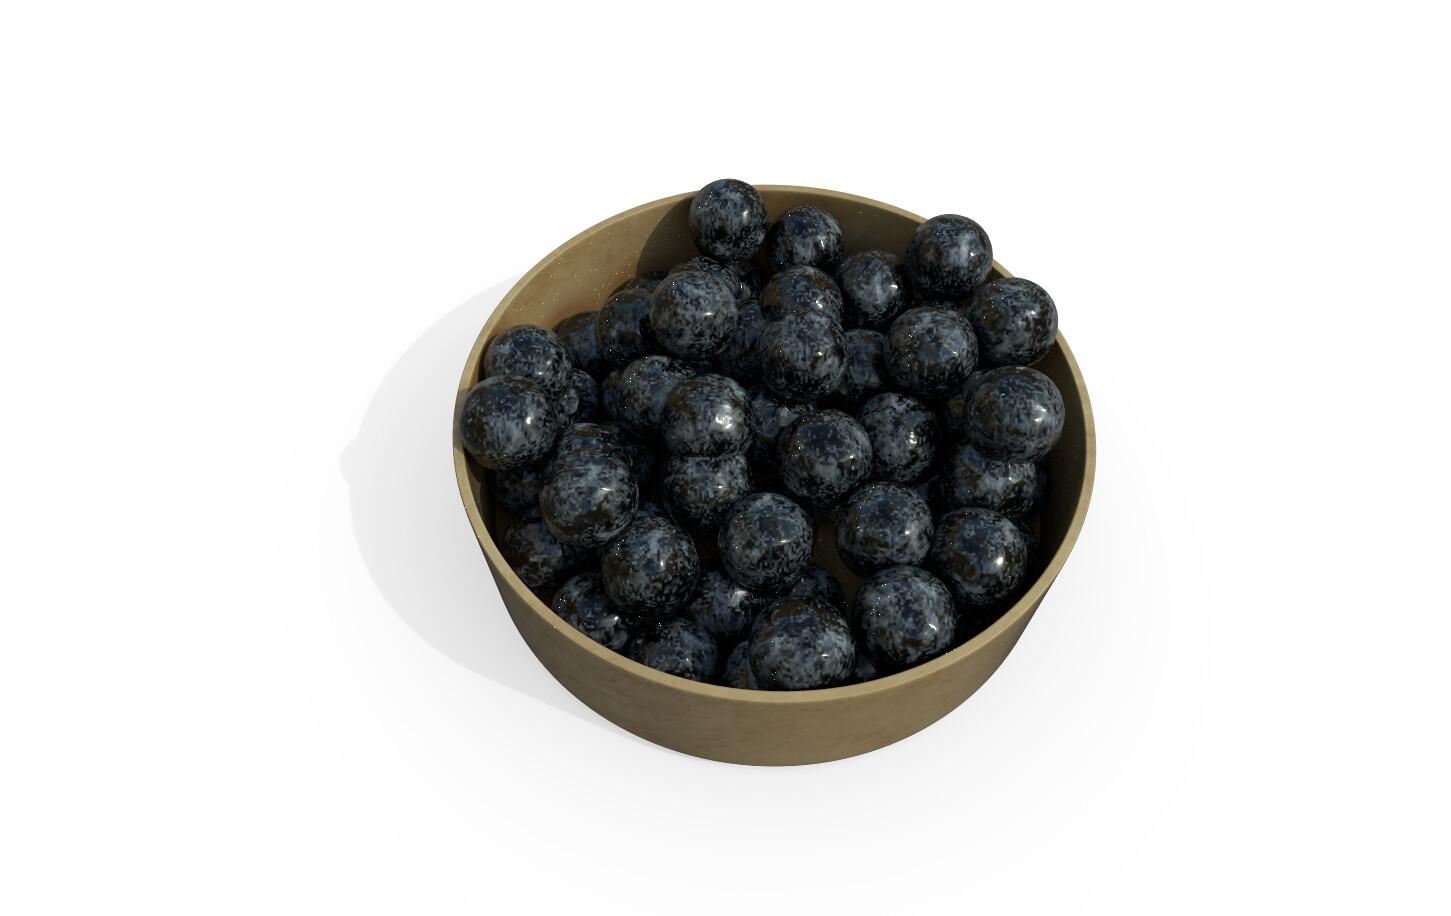 Joseph moniz blueberry001m